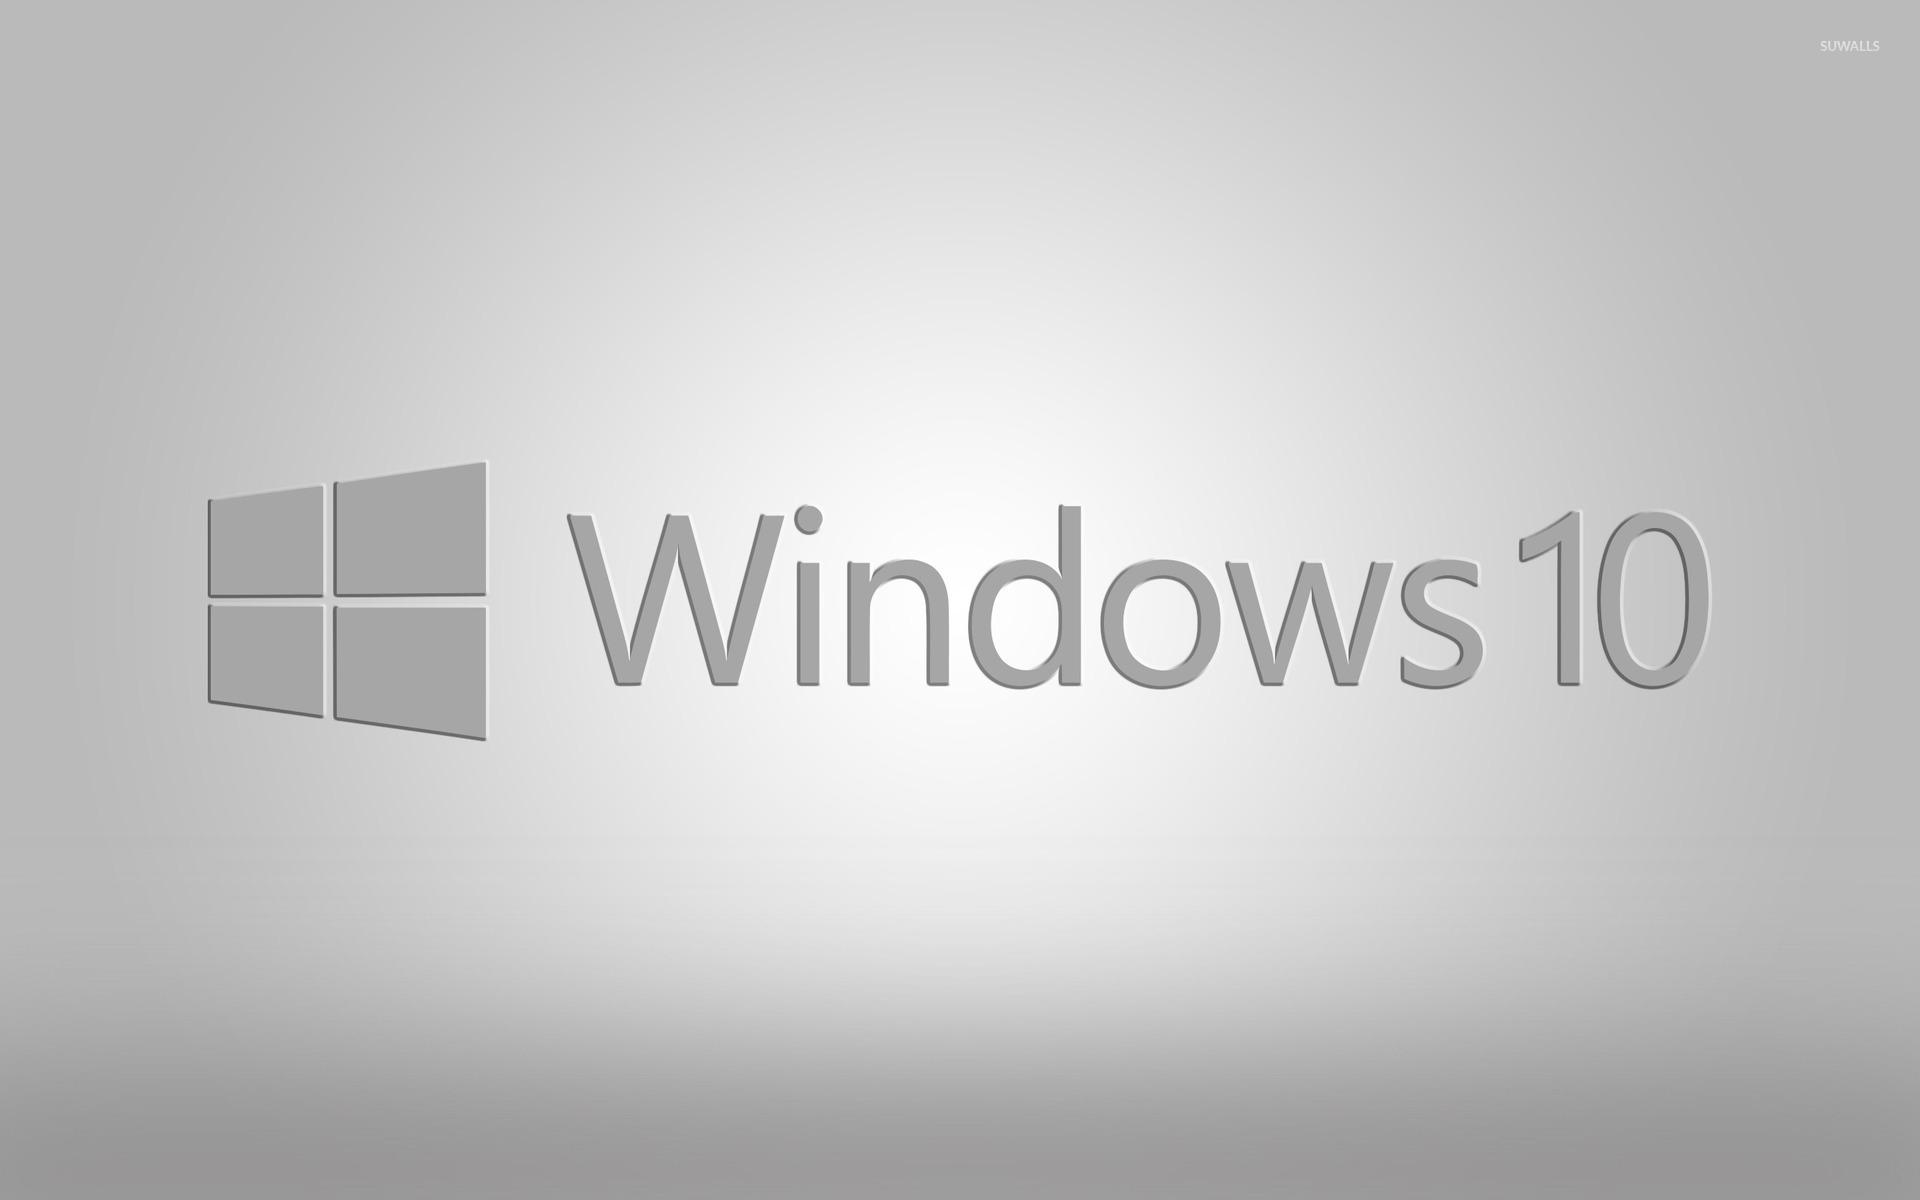 Windows 10 Gray Text Logo On Gray Gradient Wallpaper